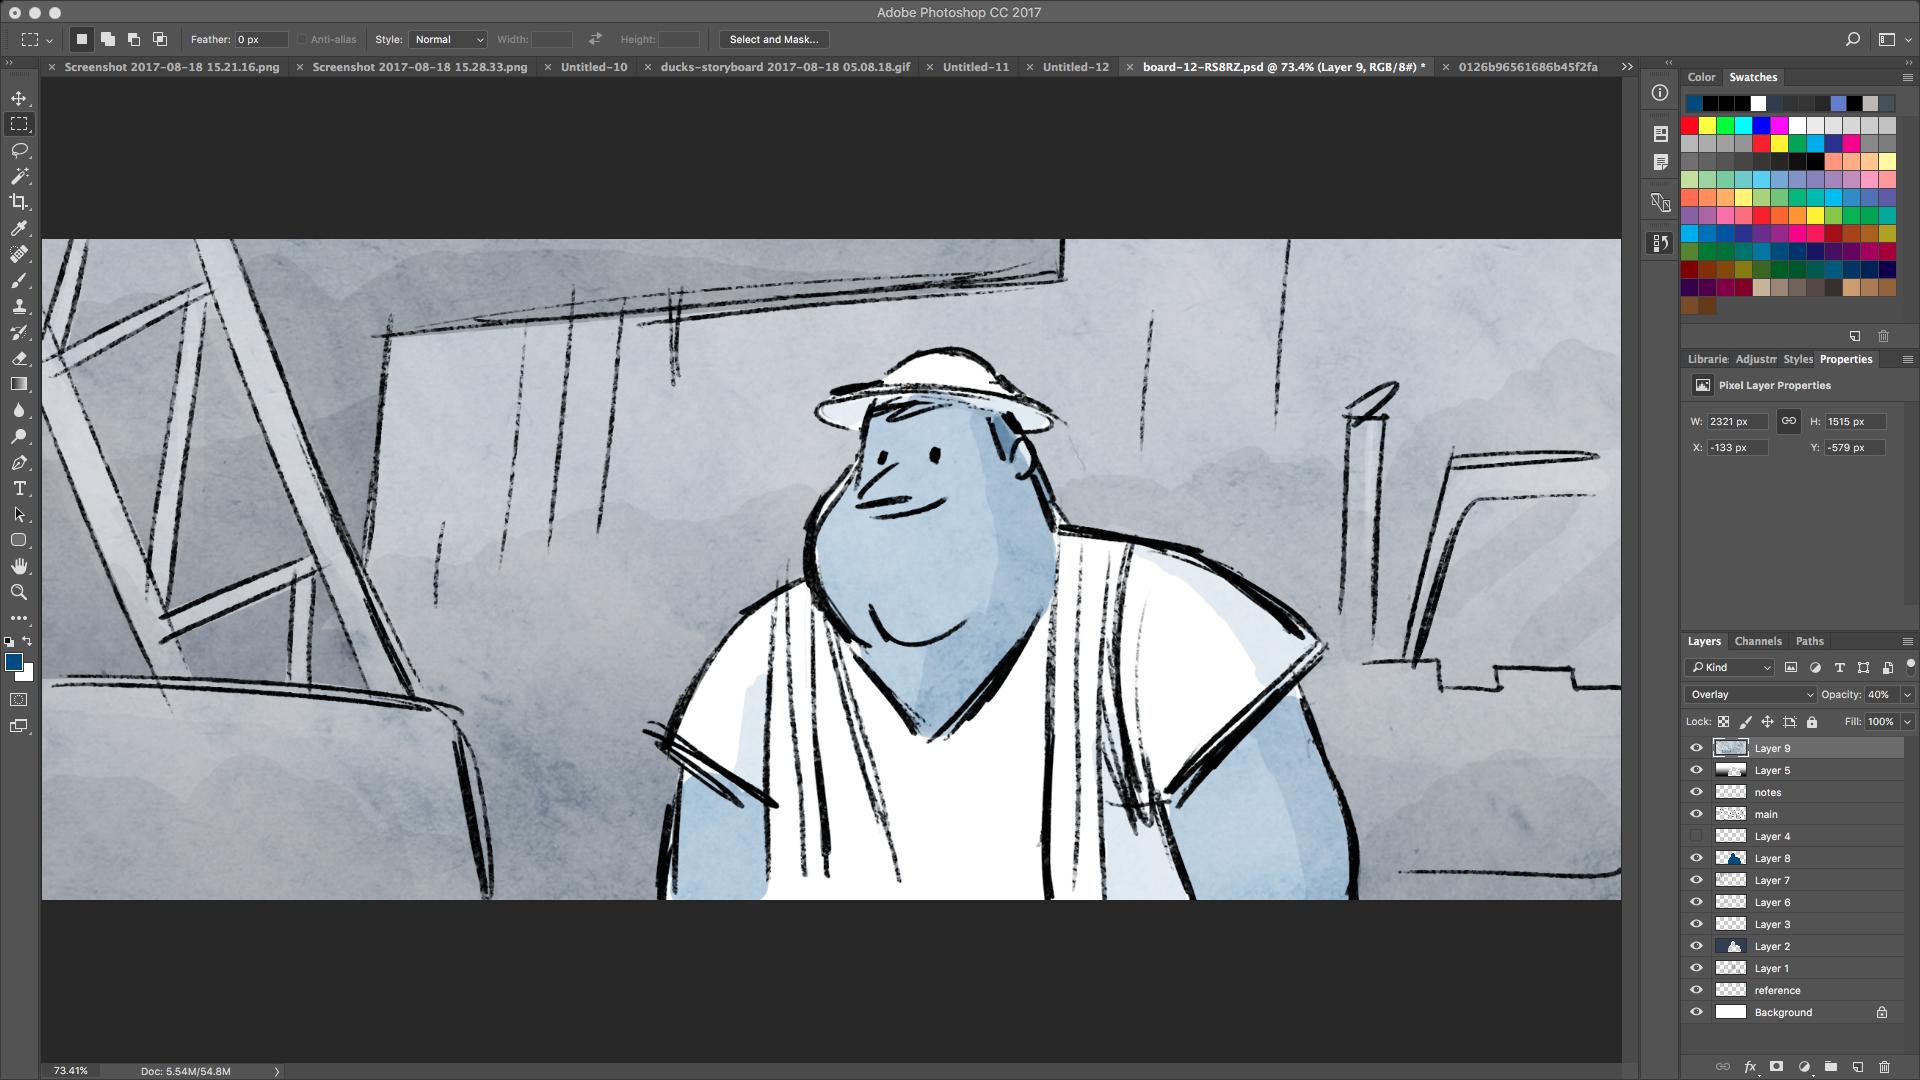 Storyboarder.